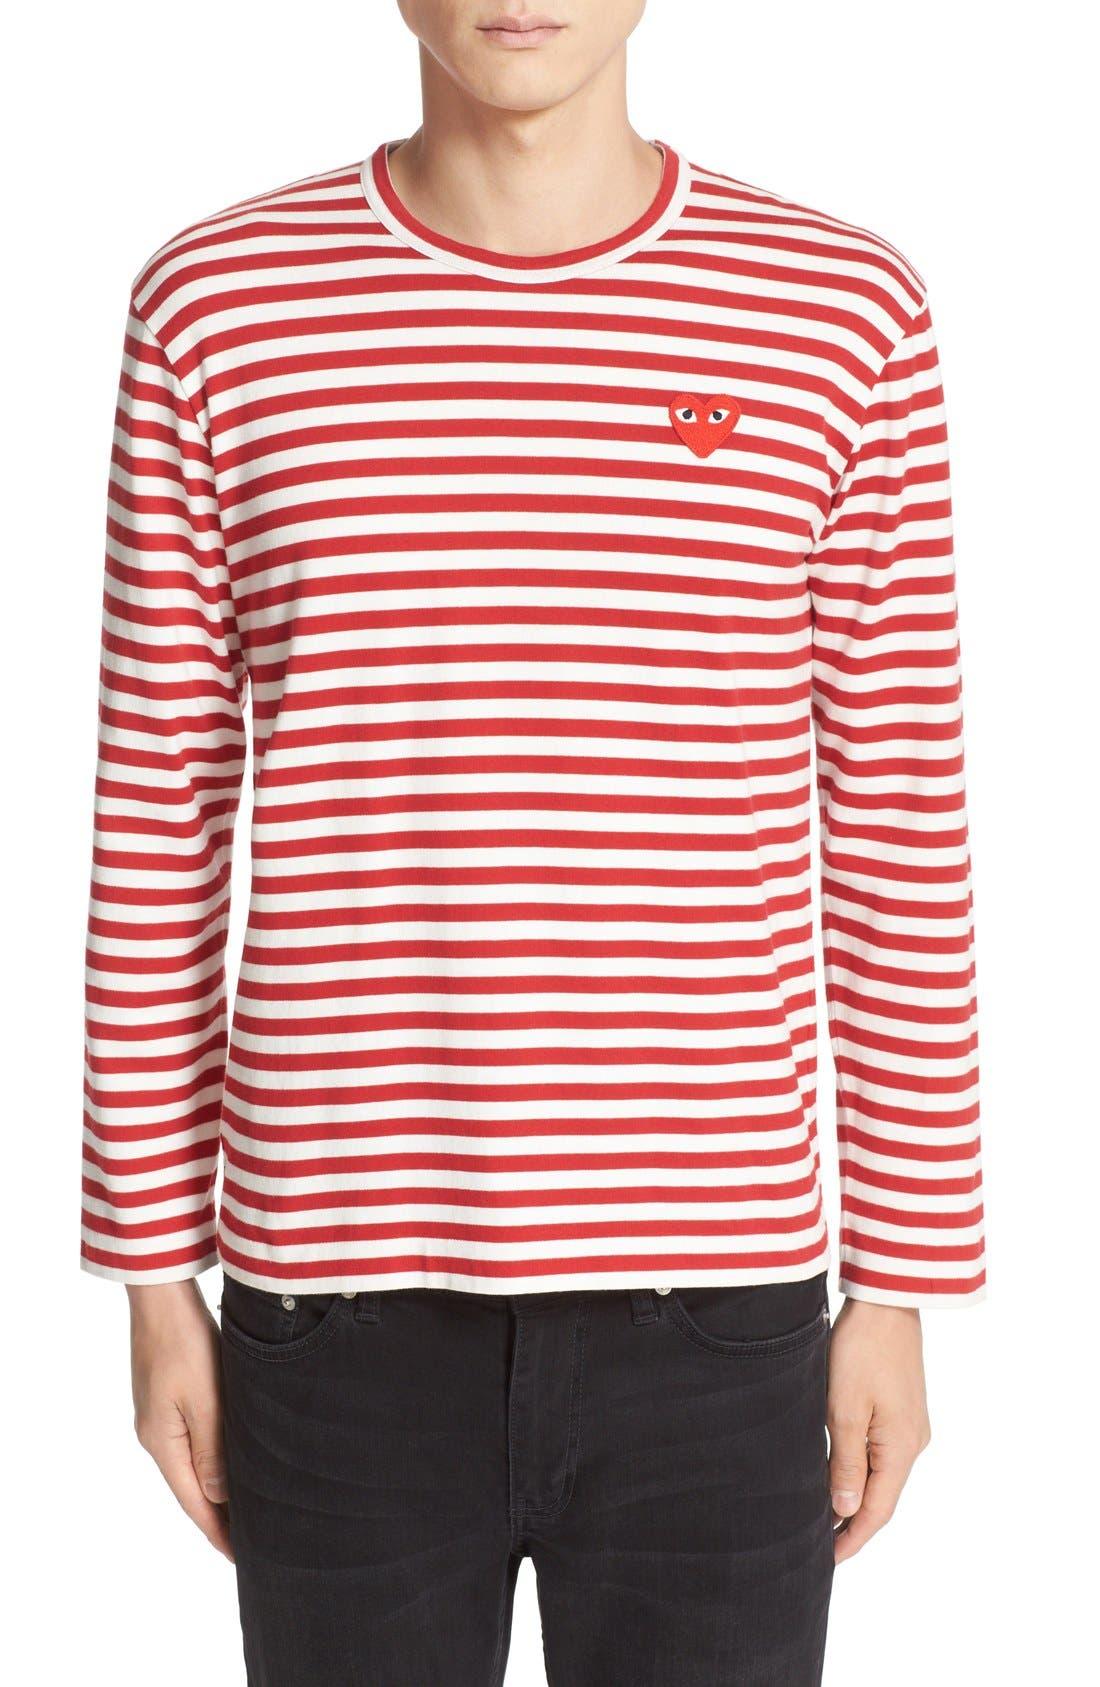 Comme des Garçons PLAY Stripe Long Sleeve T-Shirt,                         Main,                         color, Red/ White